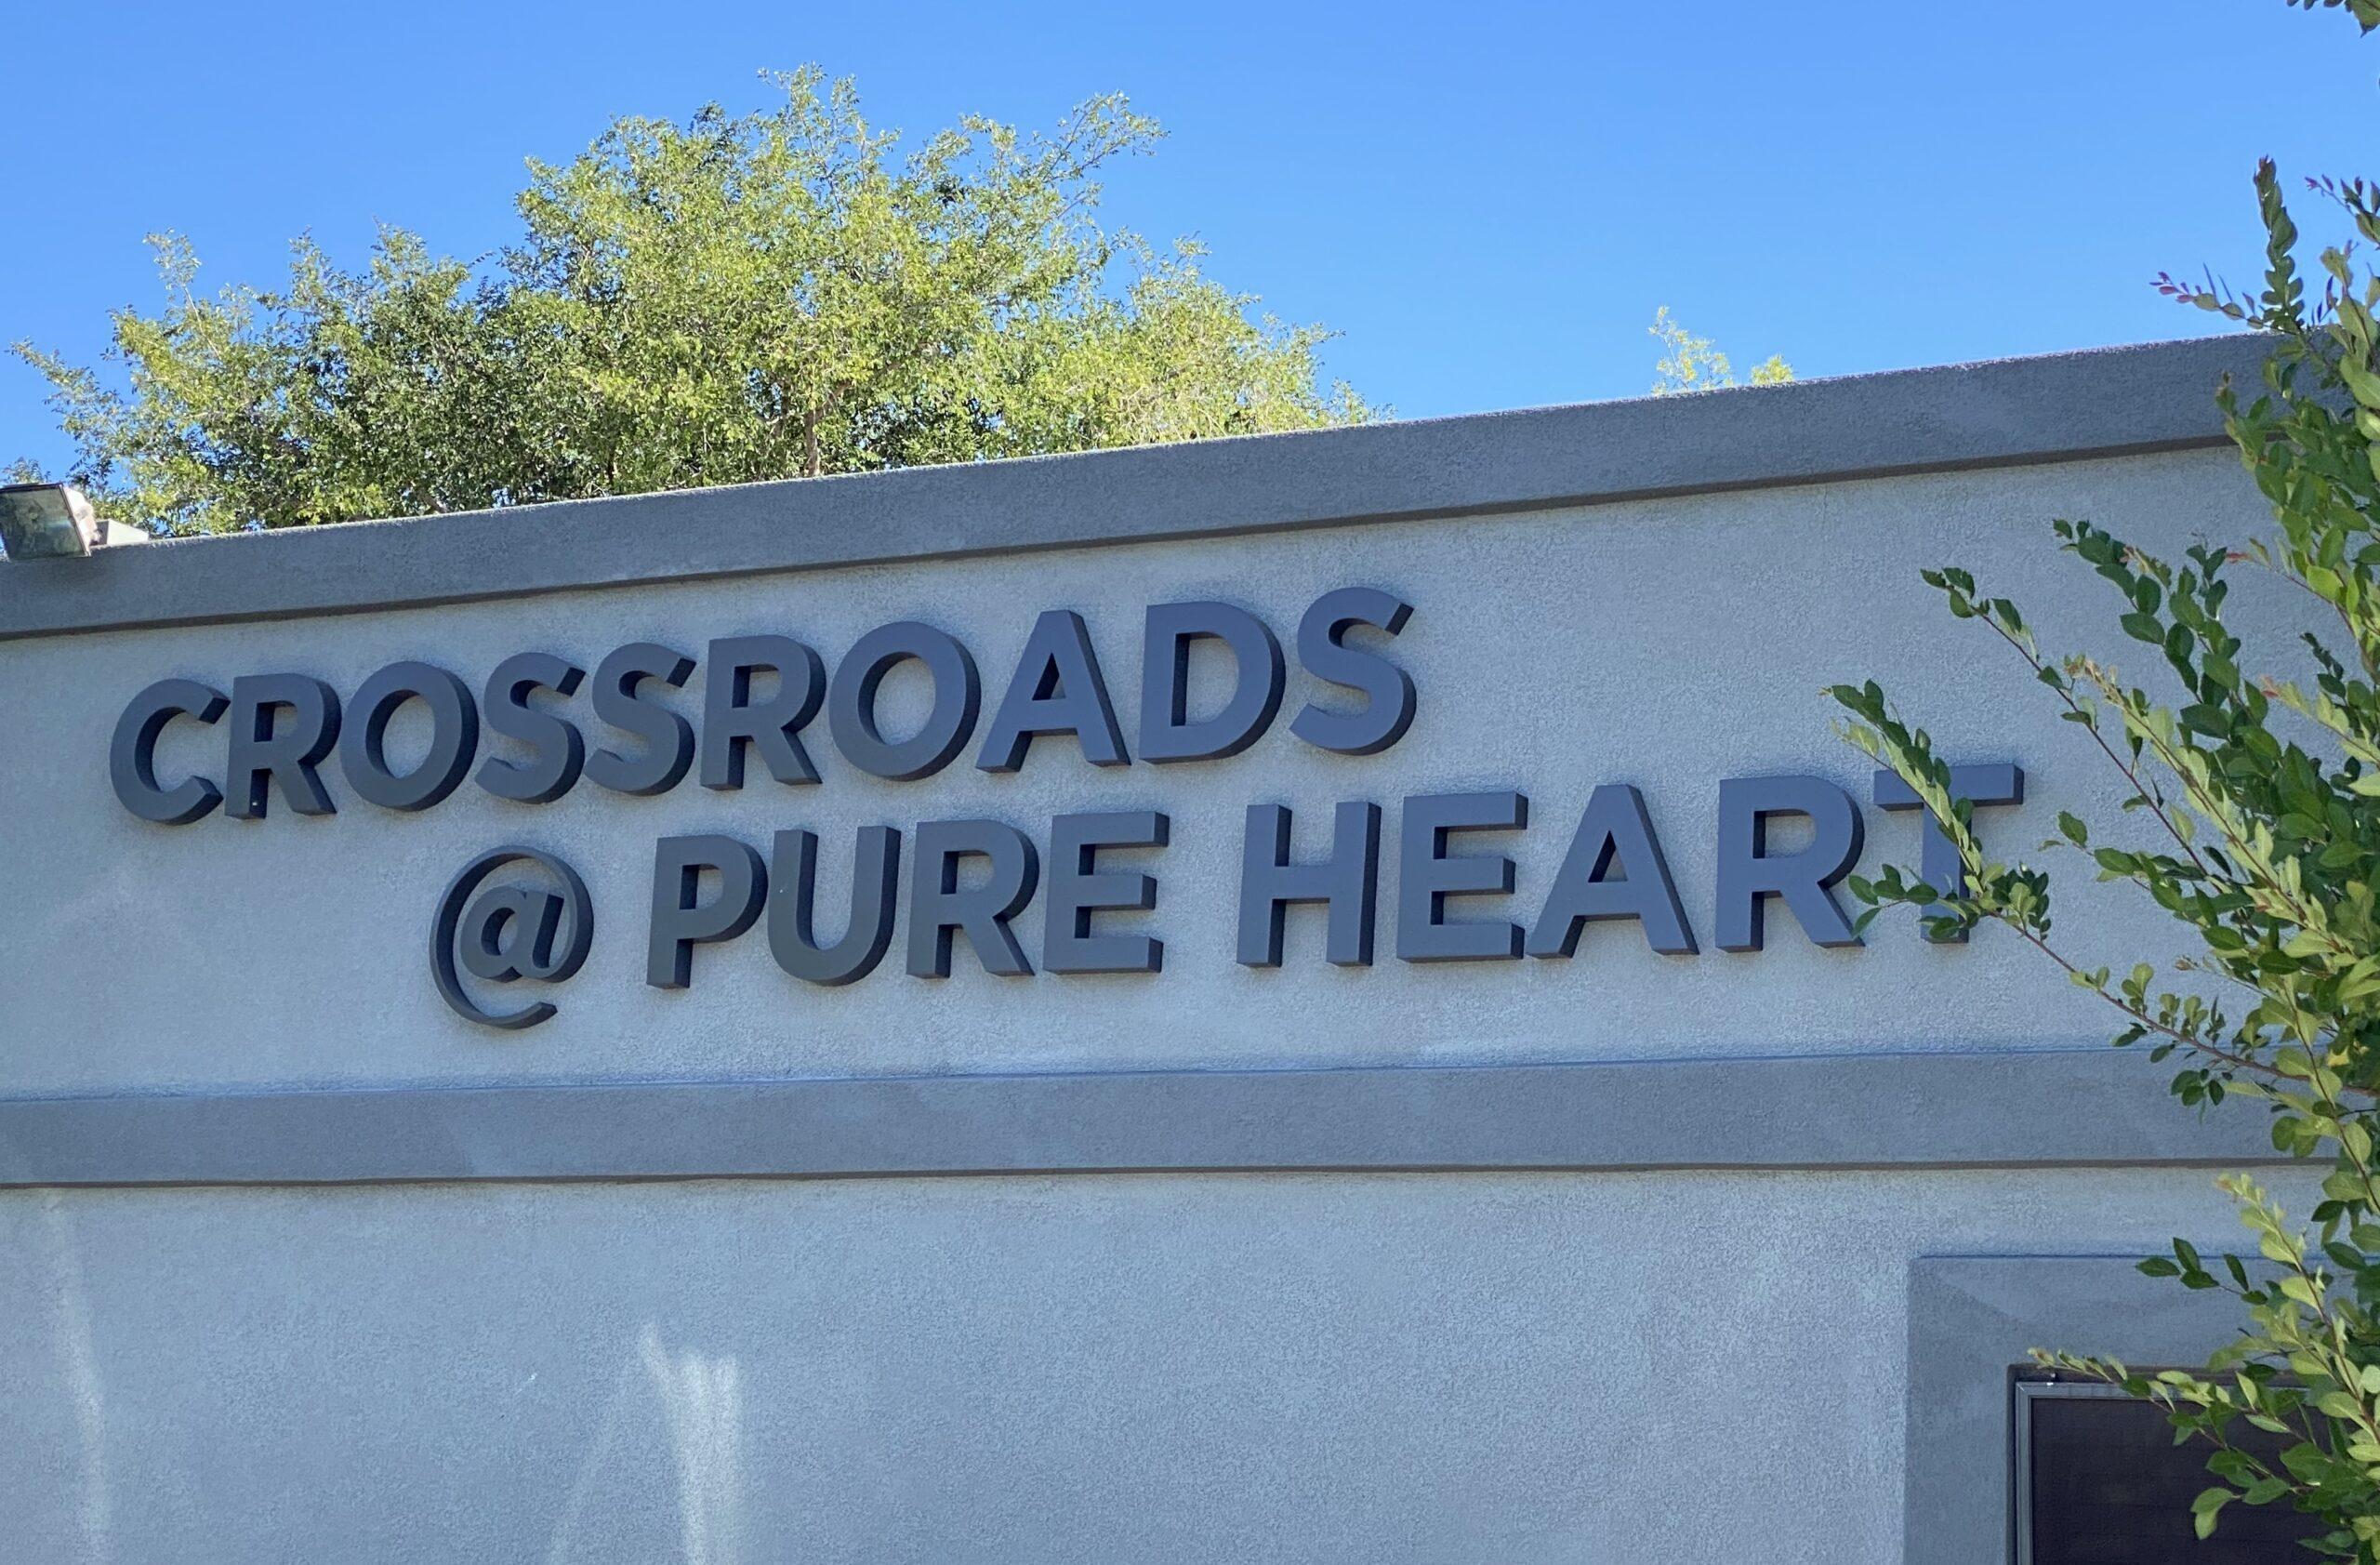 Pure Heart Outpatient treatment Program at Crossroads